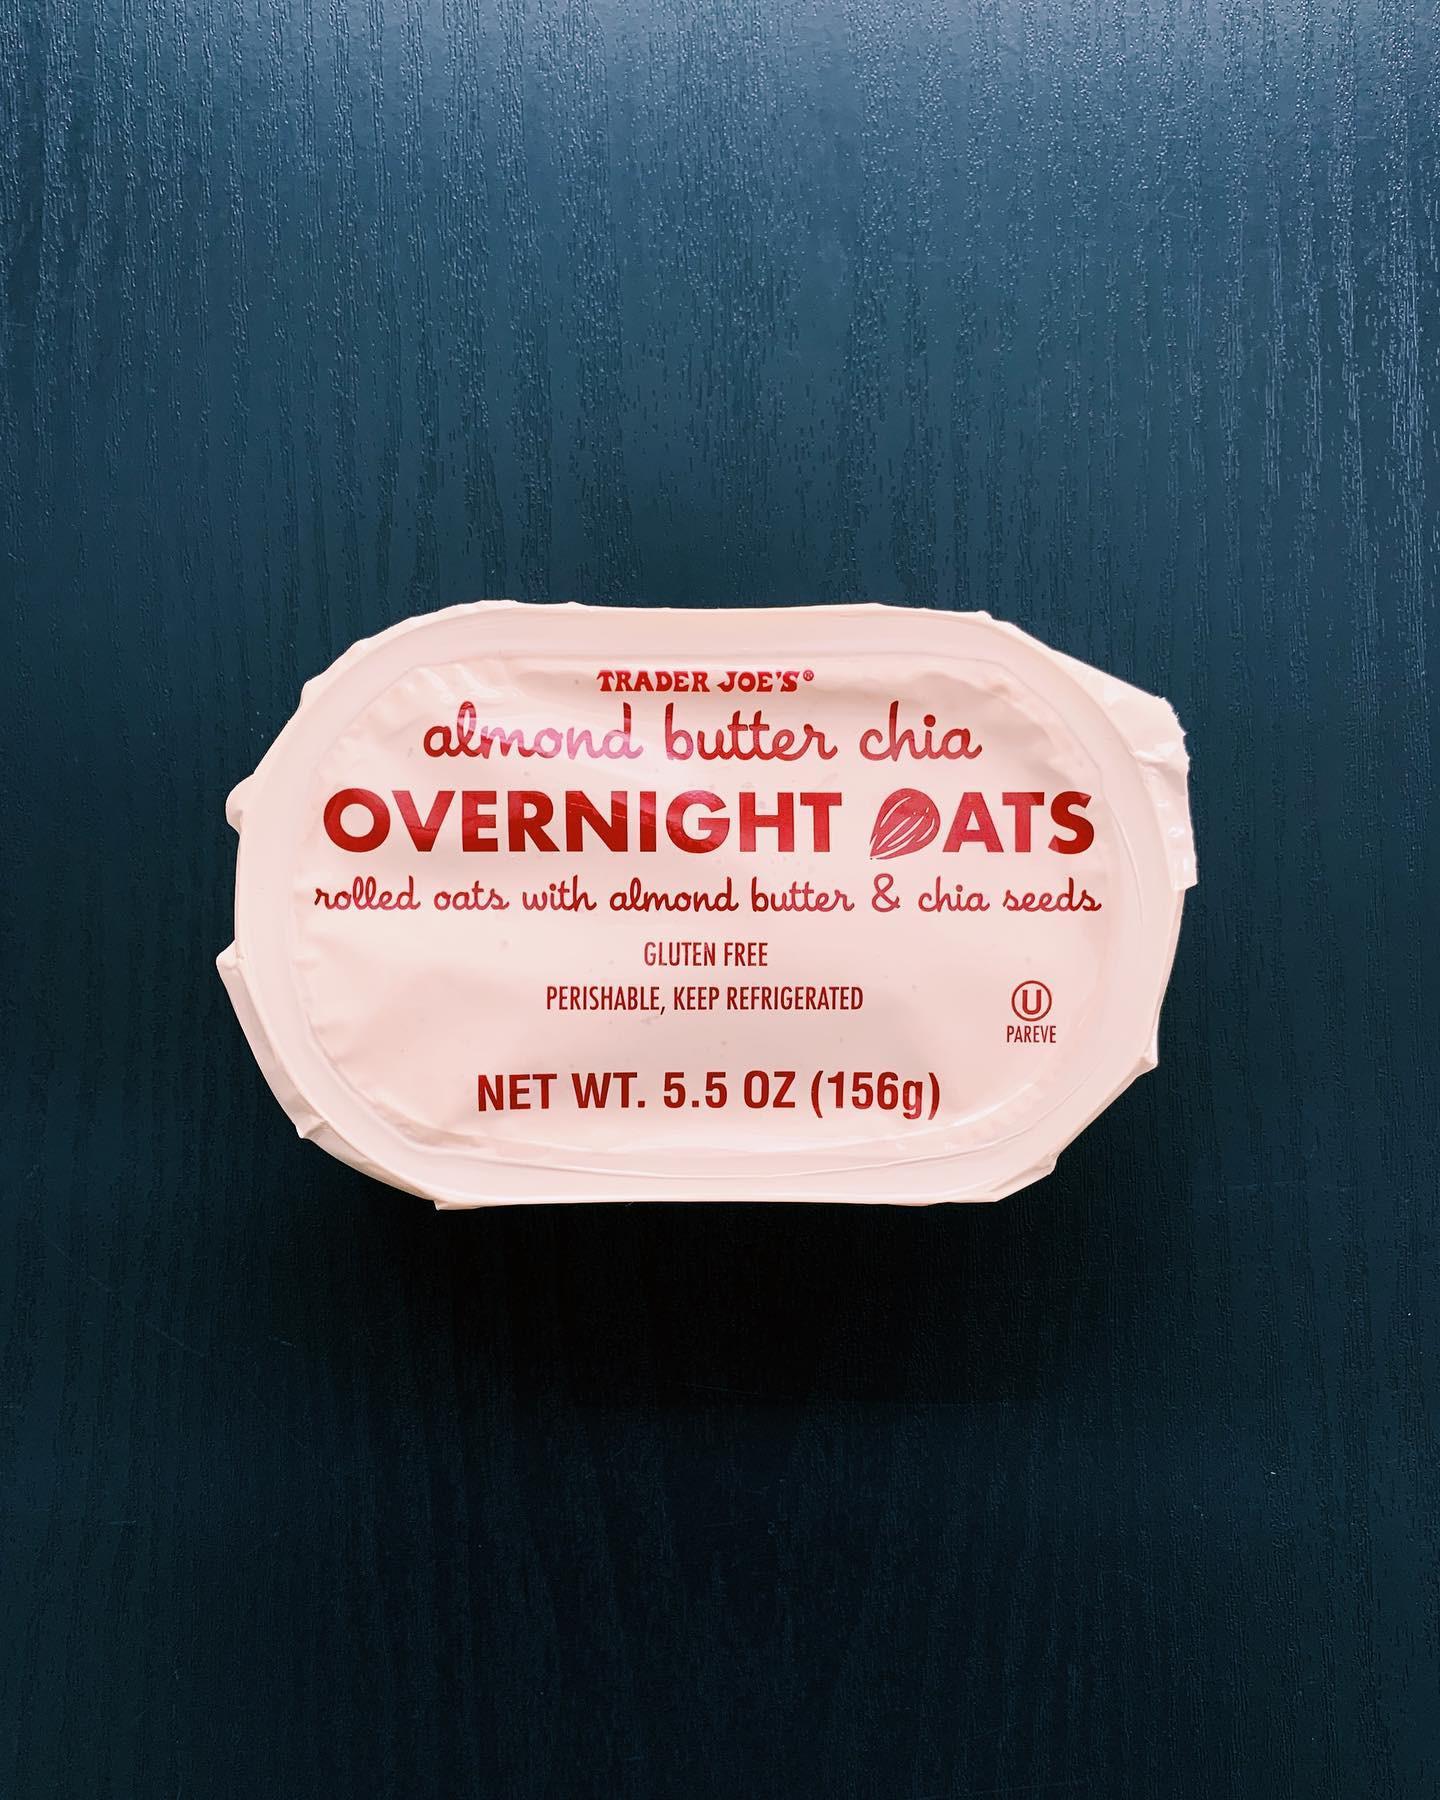 Almond Butter Chia Overnight Oats: 8/10